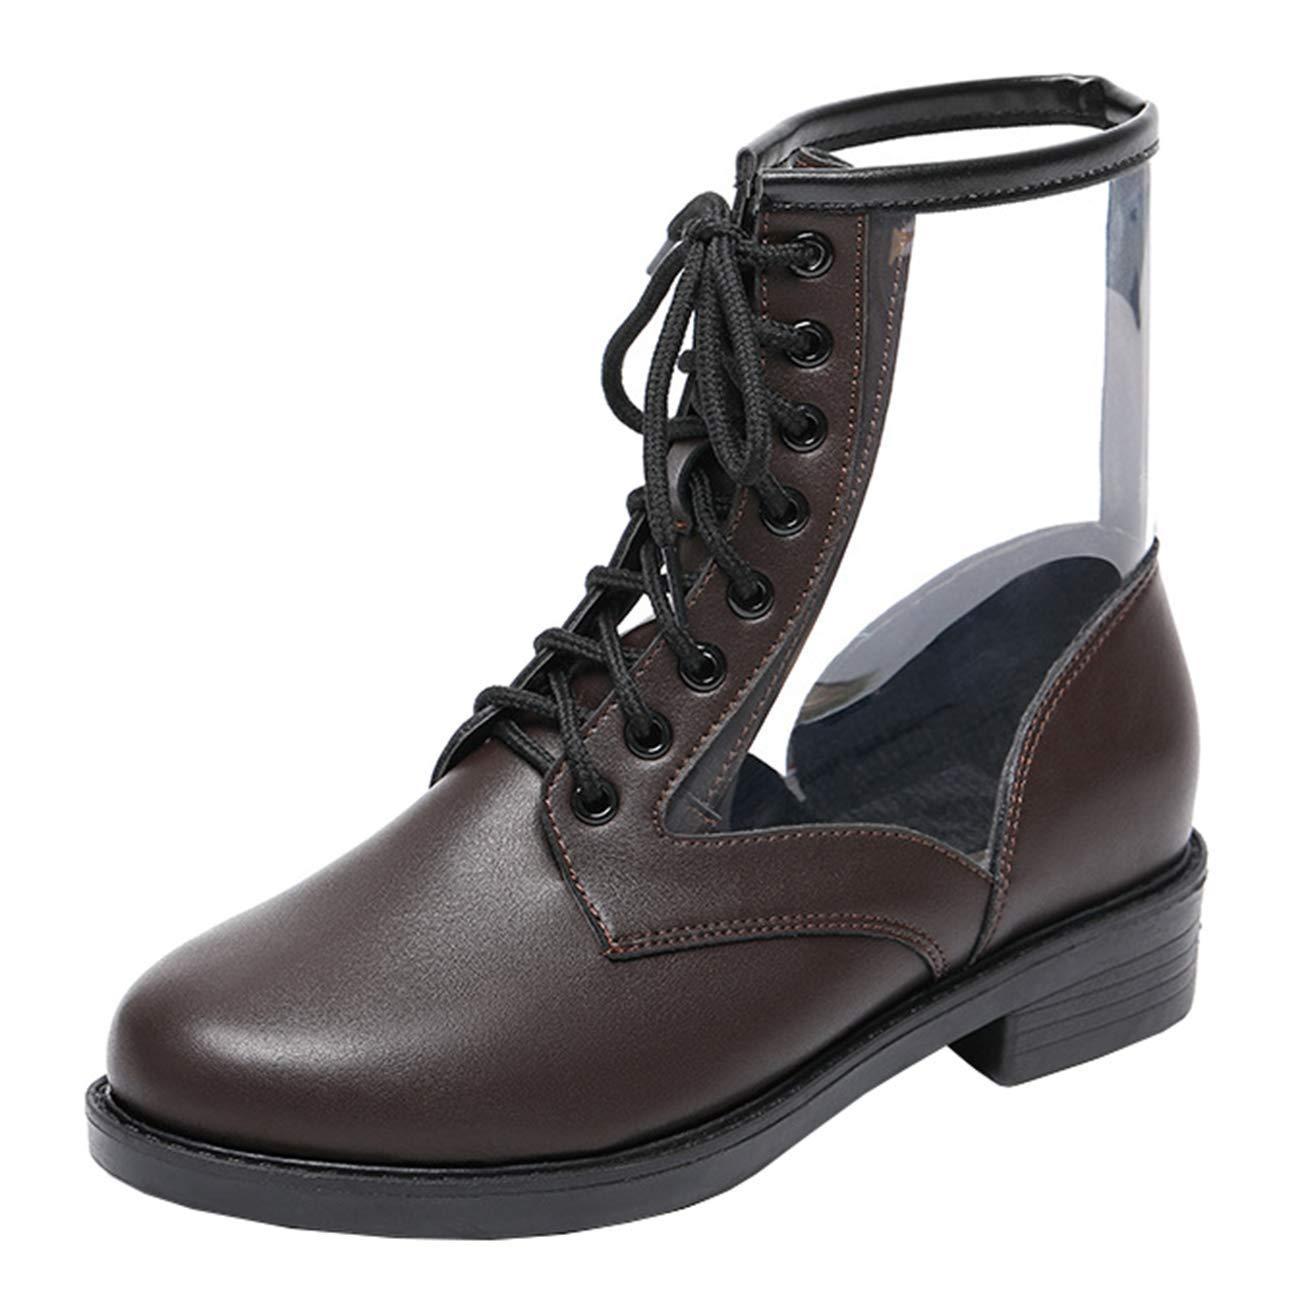 Eeayyygch Damen Runde-Toe (Farbe Block-Heel Schnürstiefeletten (Farbe Runde-Toe   Braun, Größe   4 UK) 6fa4f7